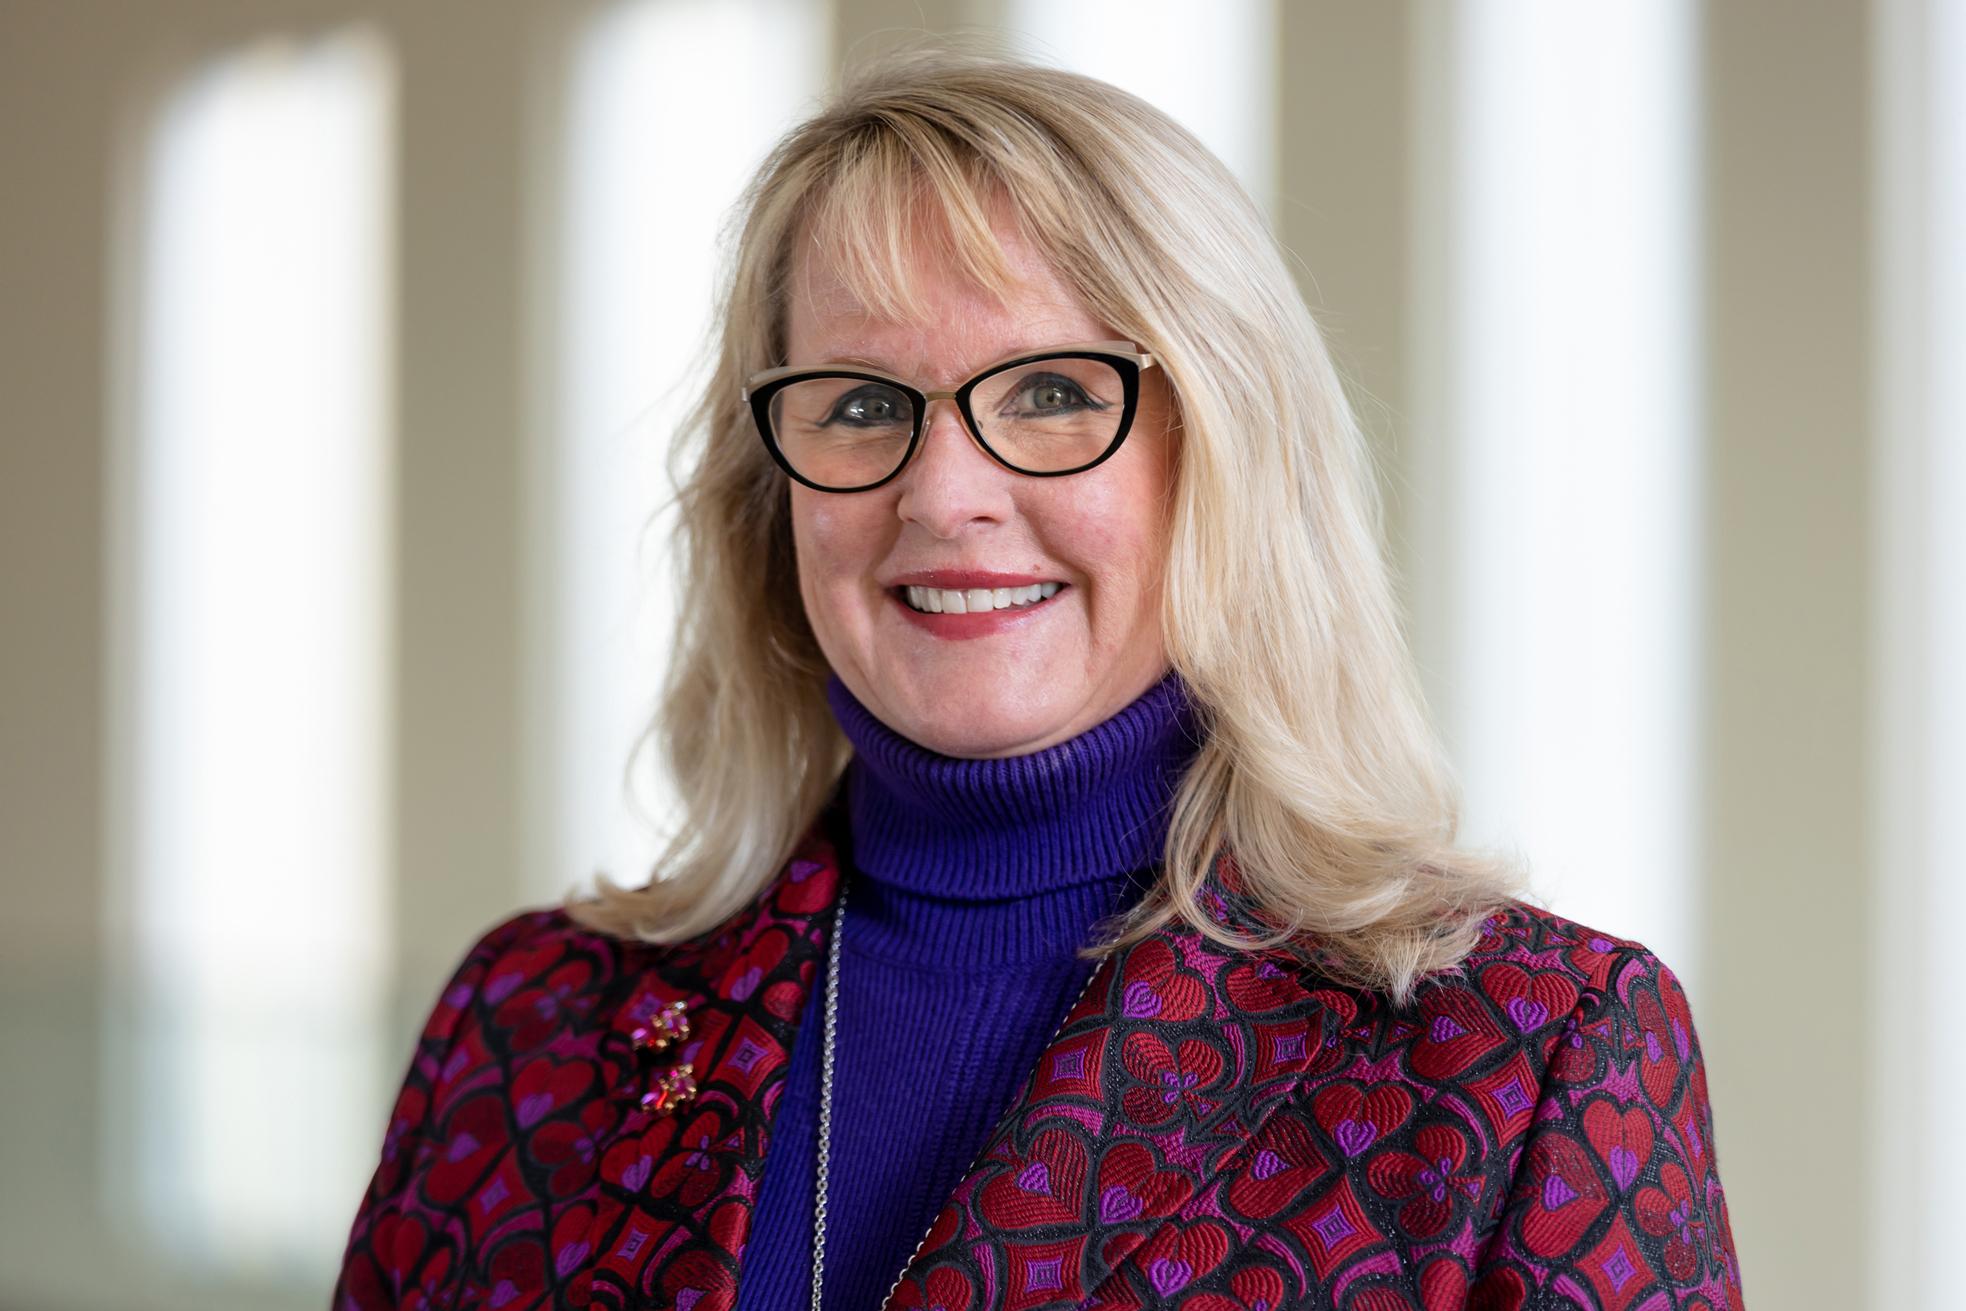 Headshot of Lou Kennedy, Speaker at the Women for Women Summit